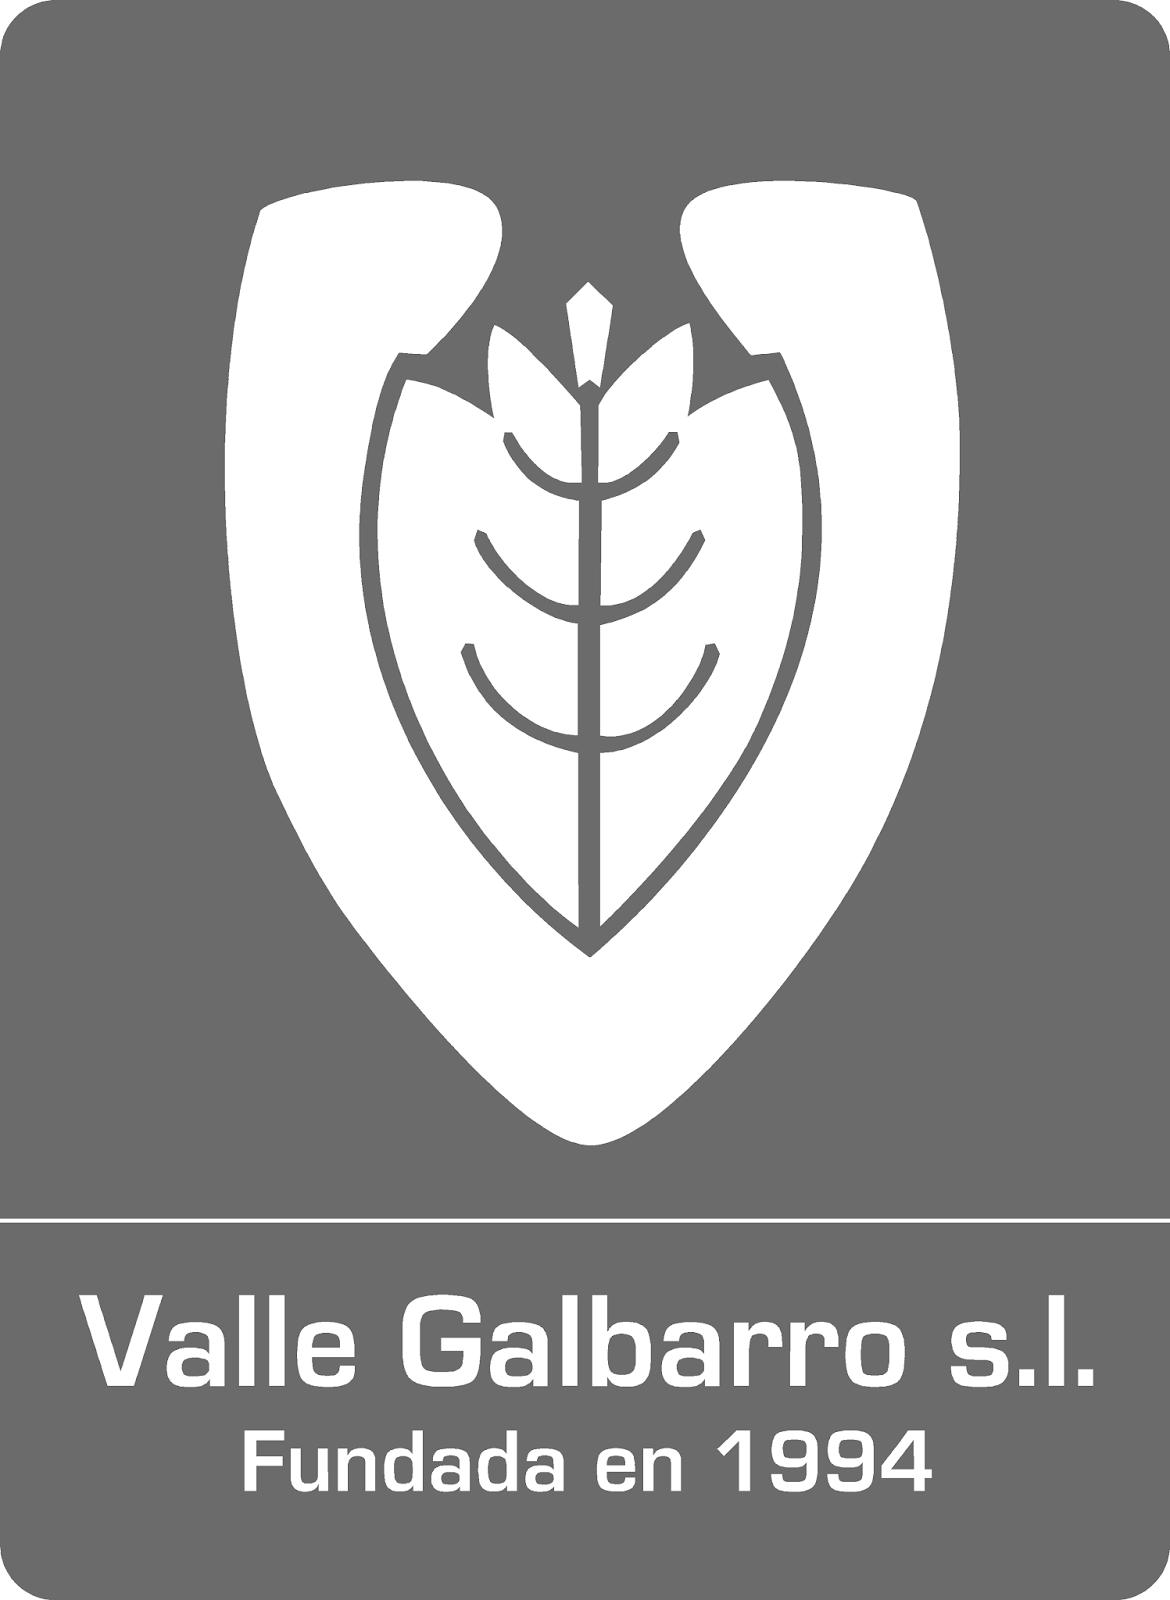 Valle Galbarro